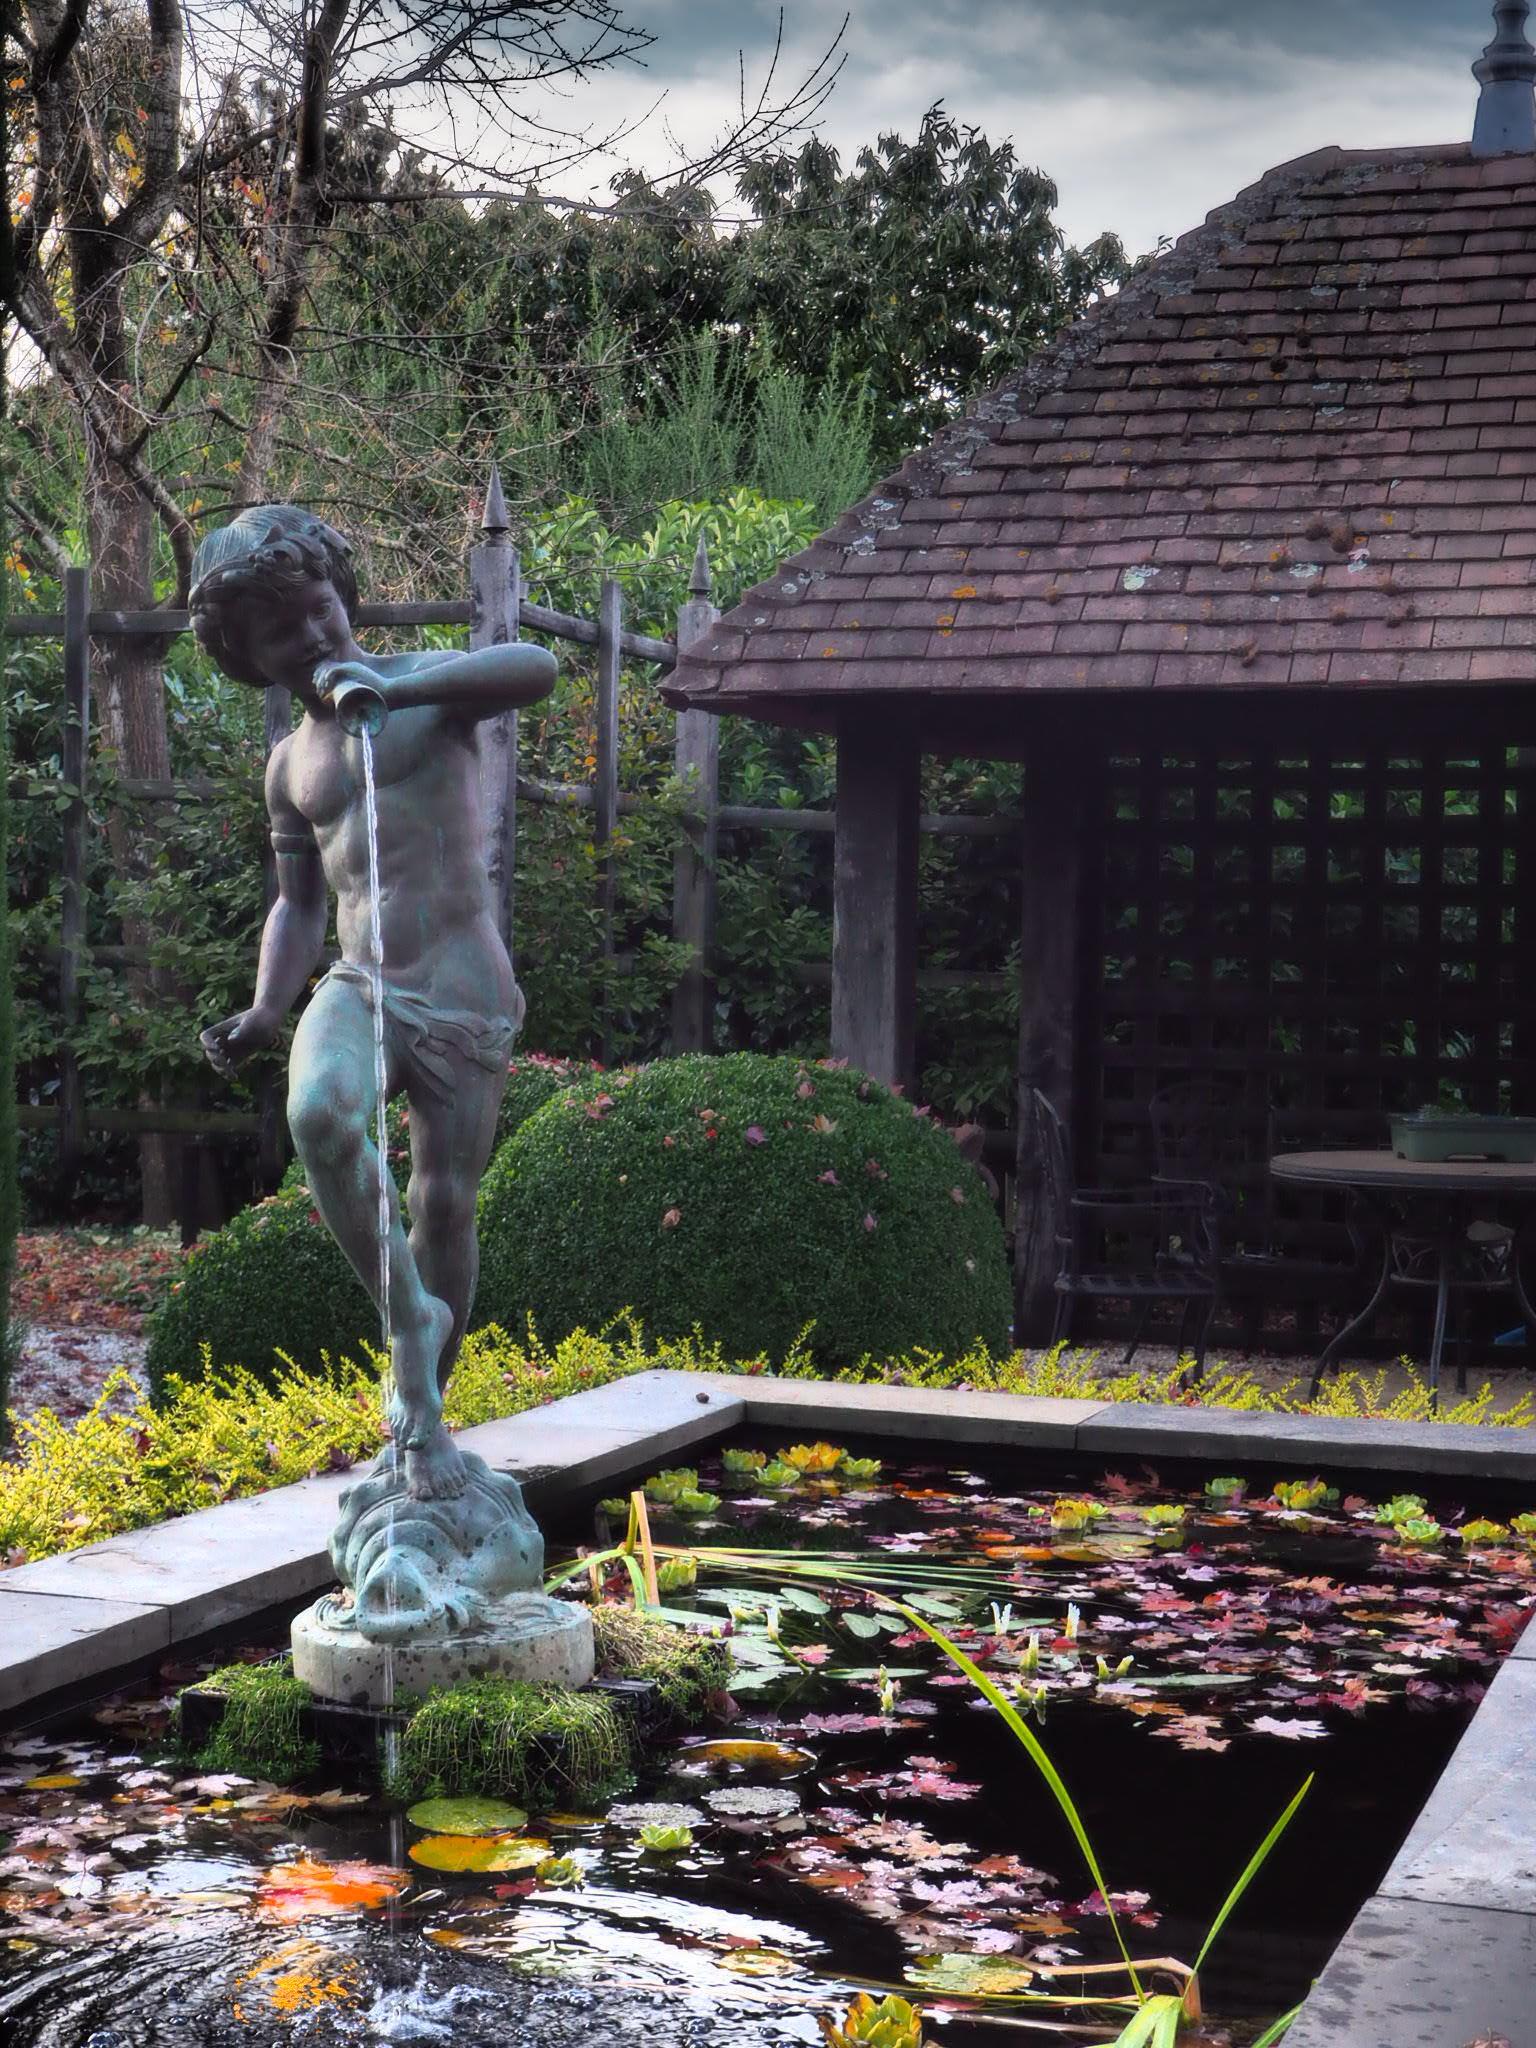 muskfarm_tank_garden_water_fountain_sculpture_IMG_3481.JPG